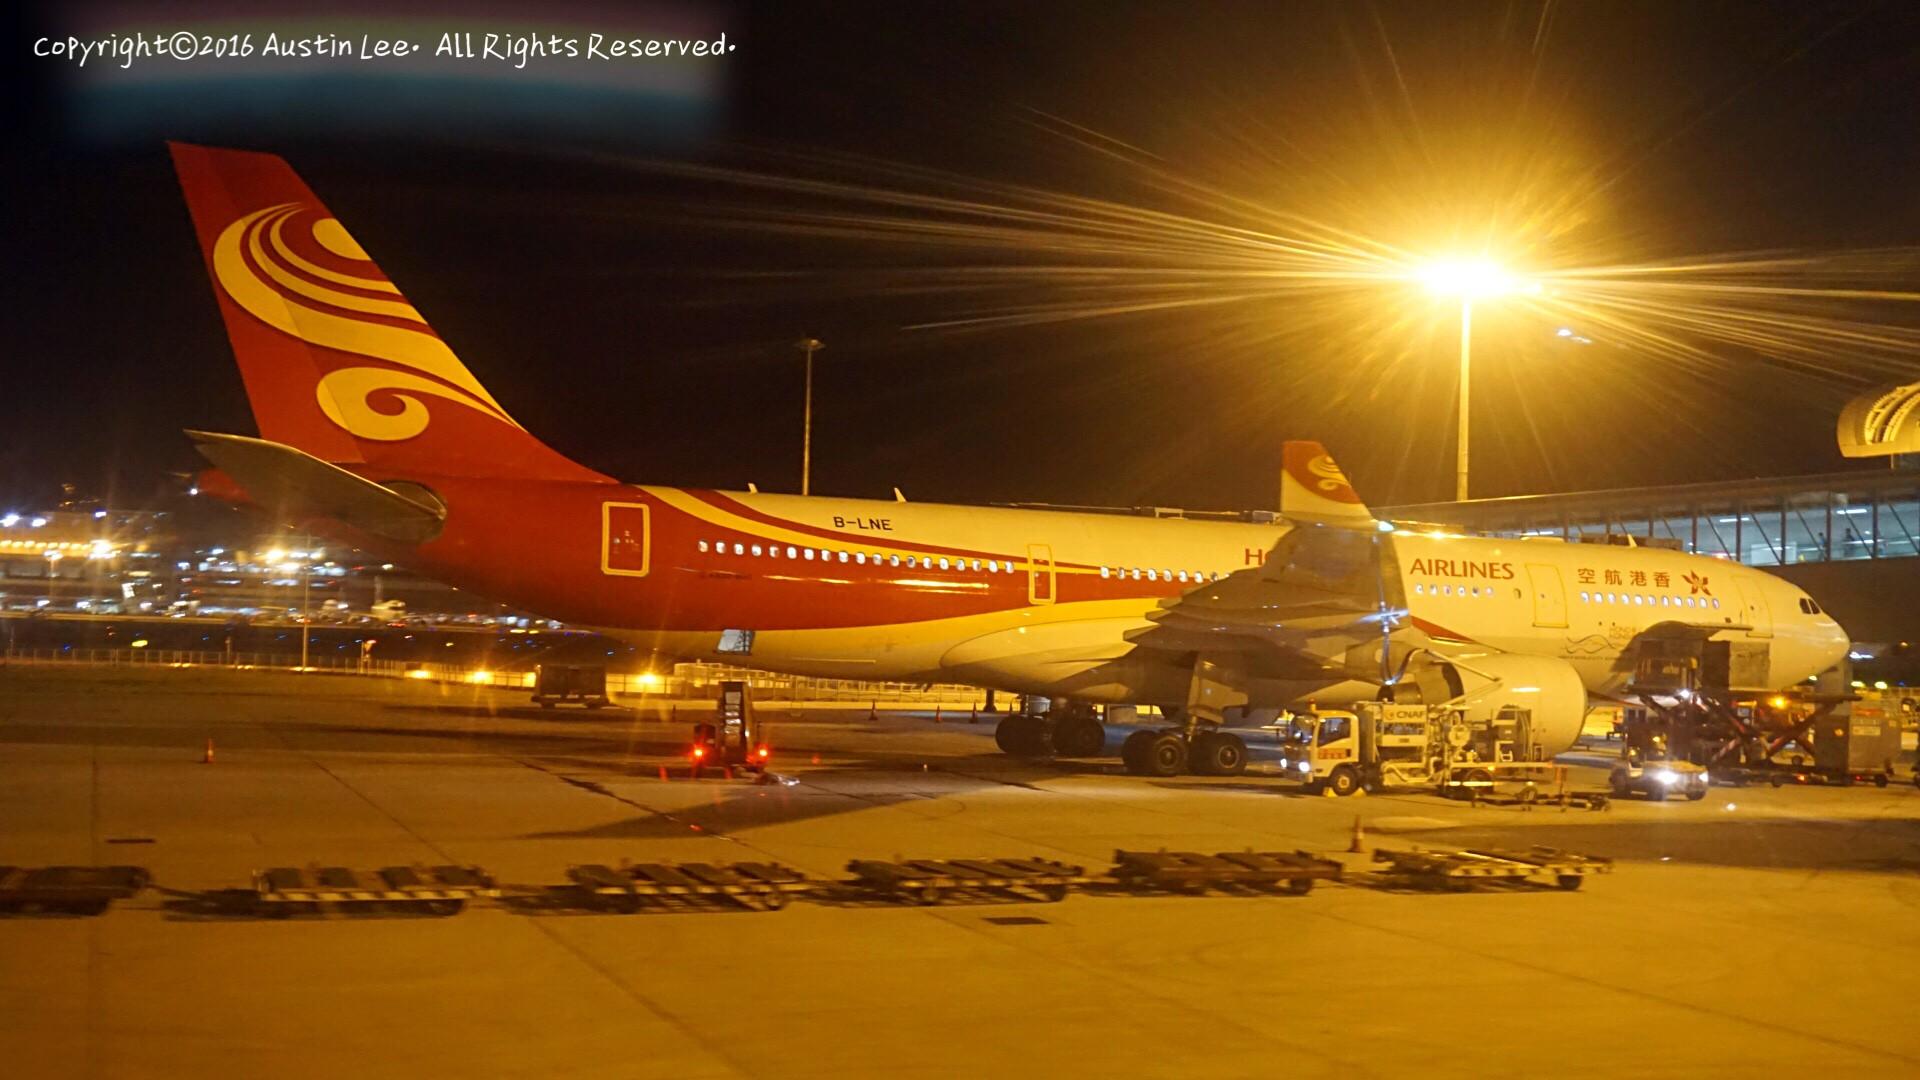 Re:[原创]论坛修复后第一波~三年来旅游途中的拍机精选~不定时更新 AIRBUS A330-343X B-LNP 中国香港国际机场